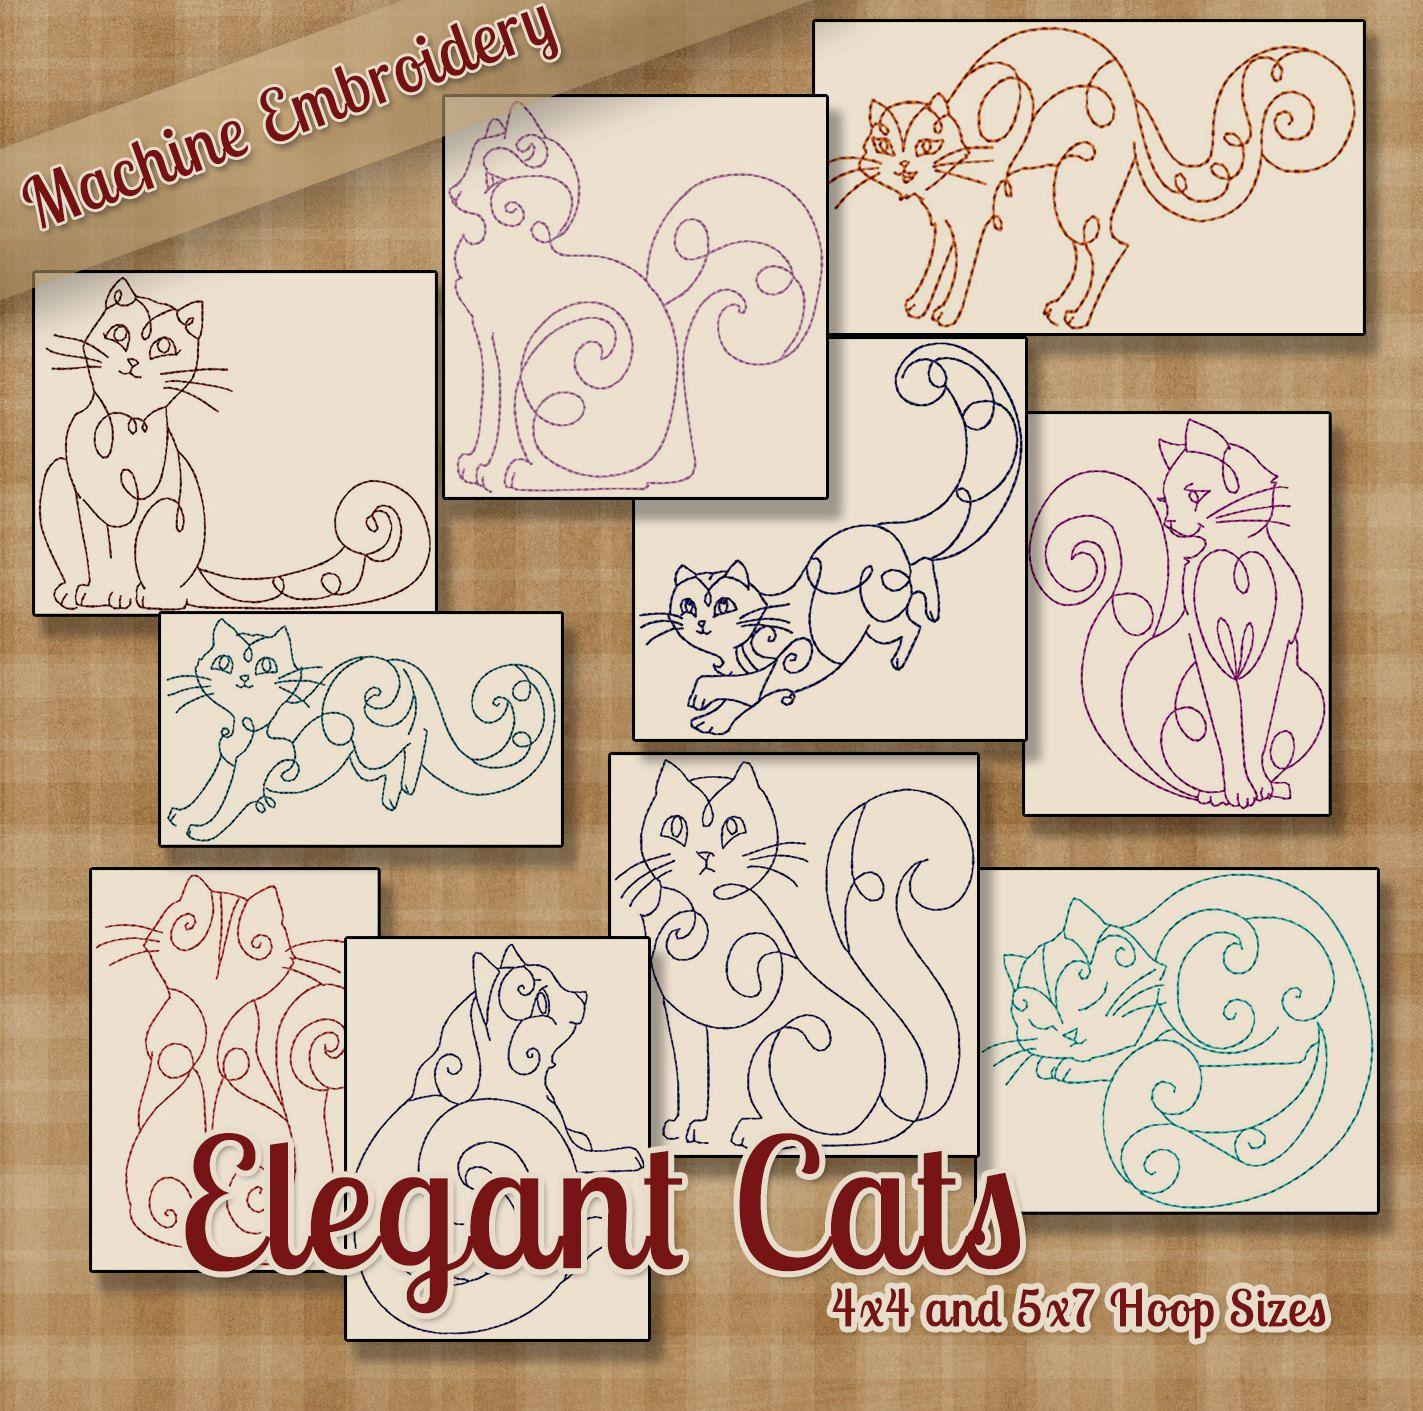 Redwork Elegant Cats Machine Embroidery Patterns / Designs